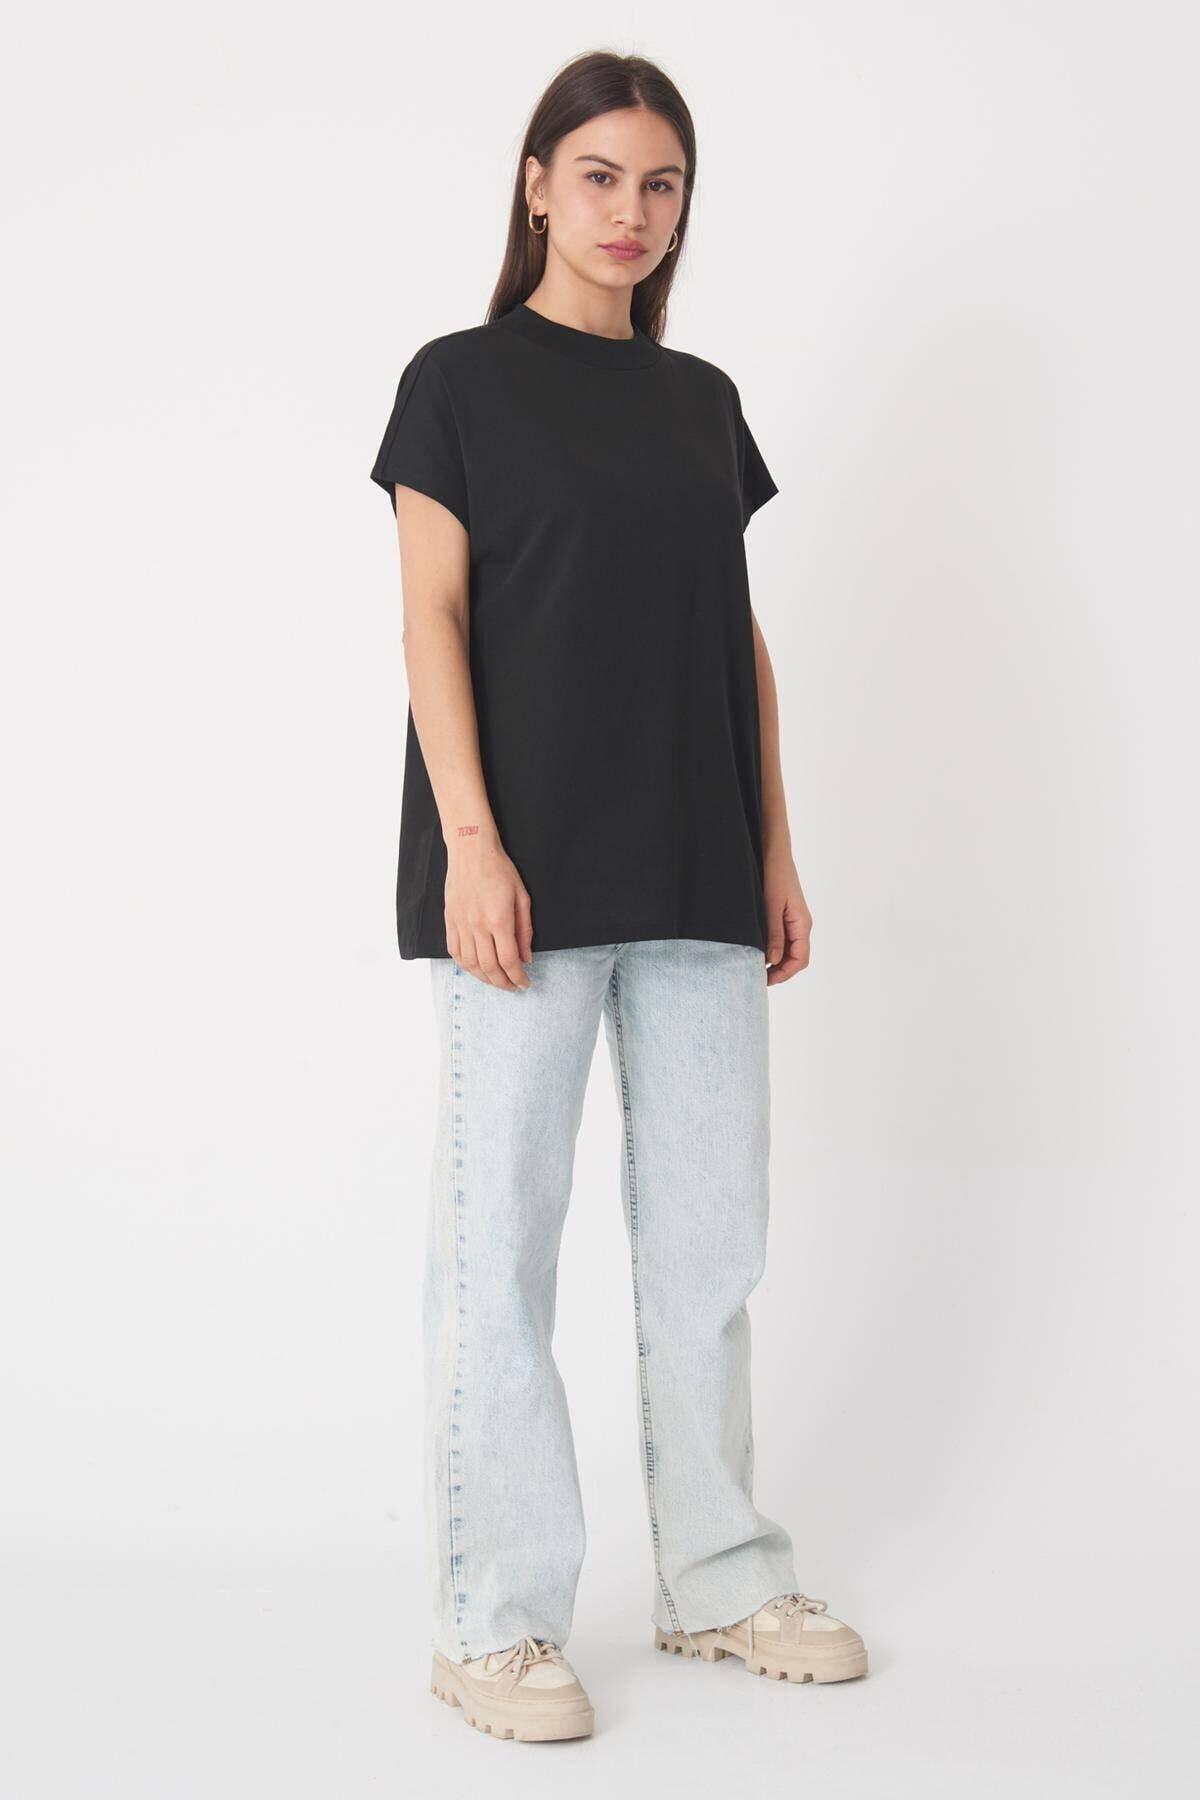 Addax Basic T-shirt P0769 - U13 2